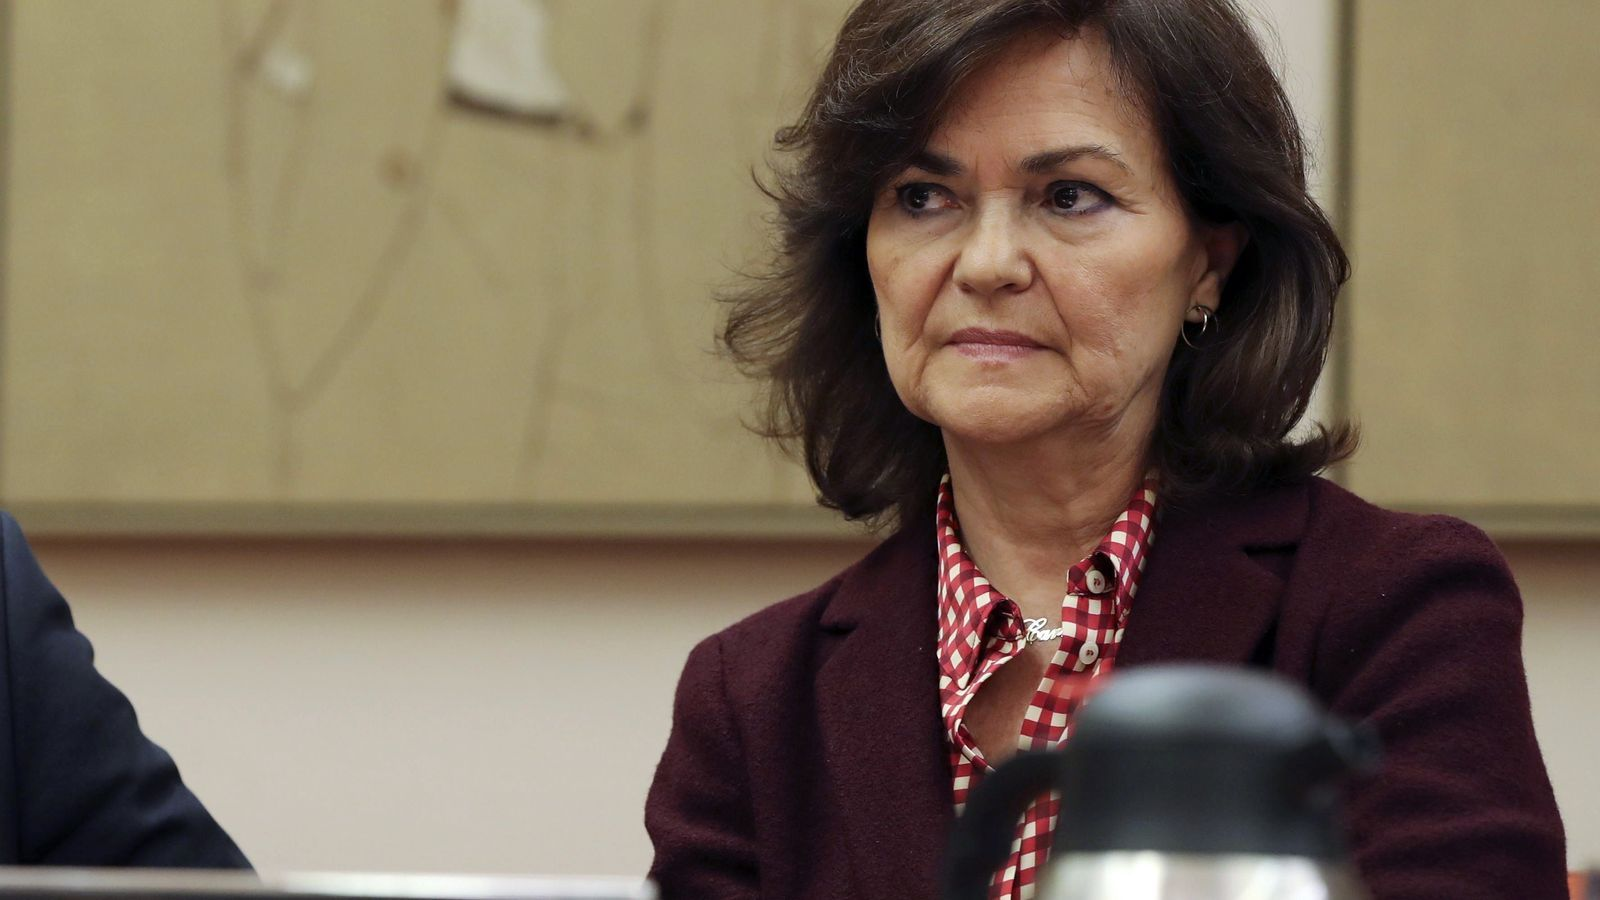 La vicepresidenta del govern espanyol, Carmen Calvo, en una imatge d'arxiu